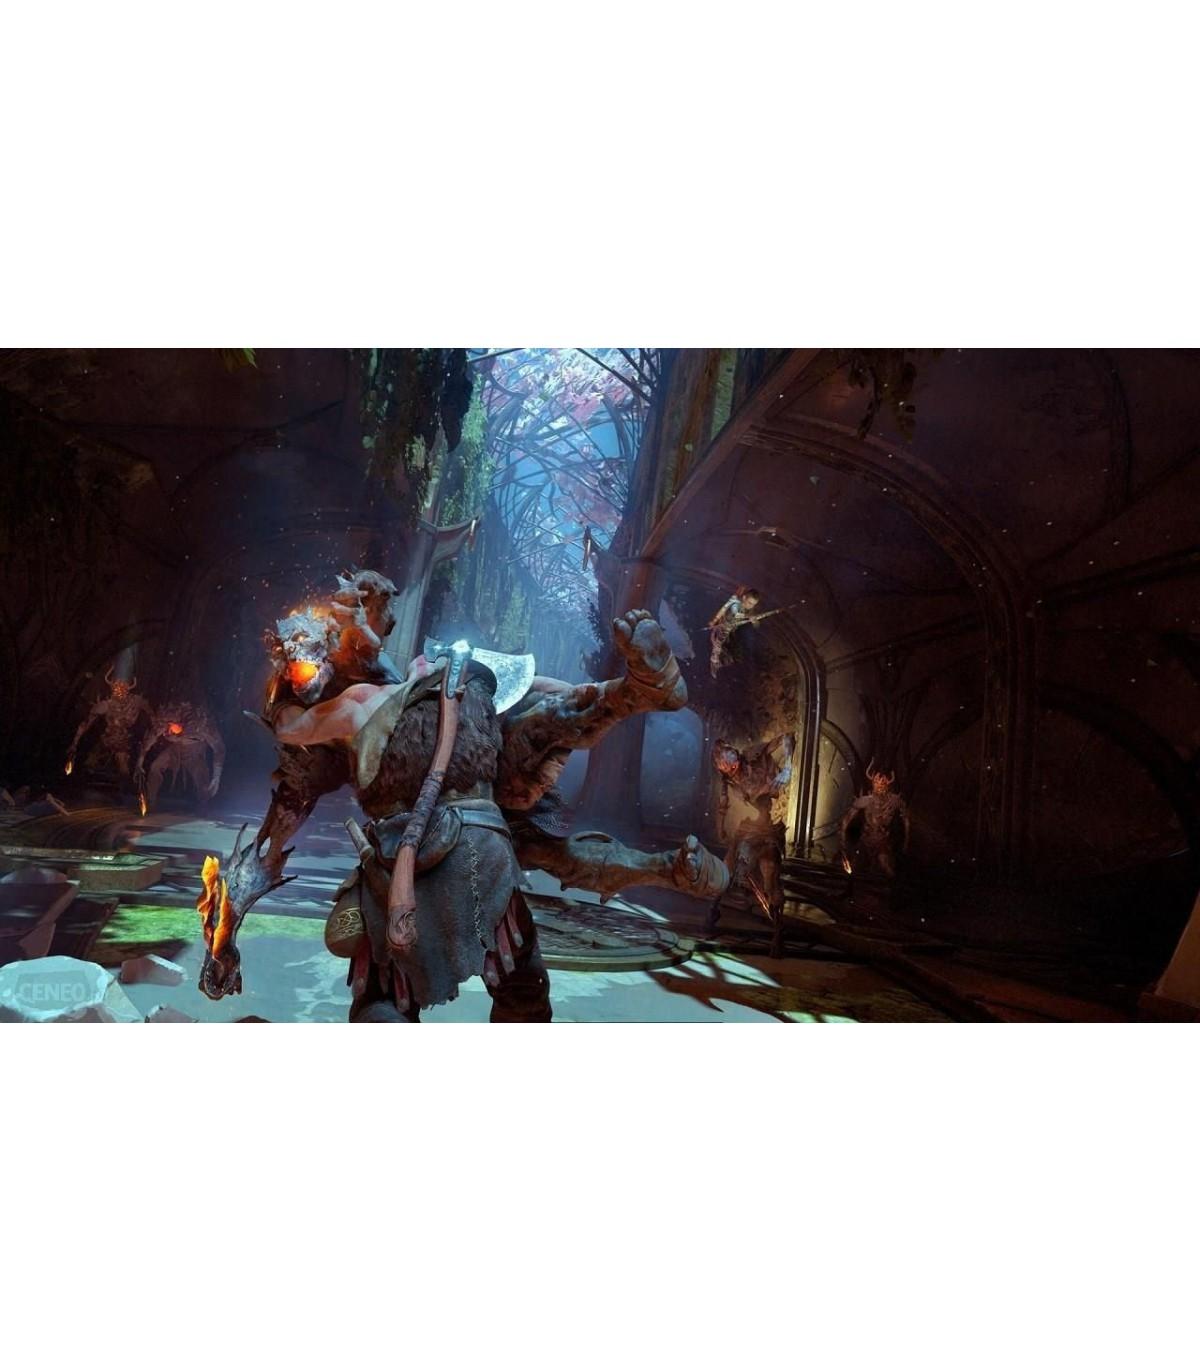 بازی God of War Day One Edition - پلی استیشن 4